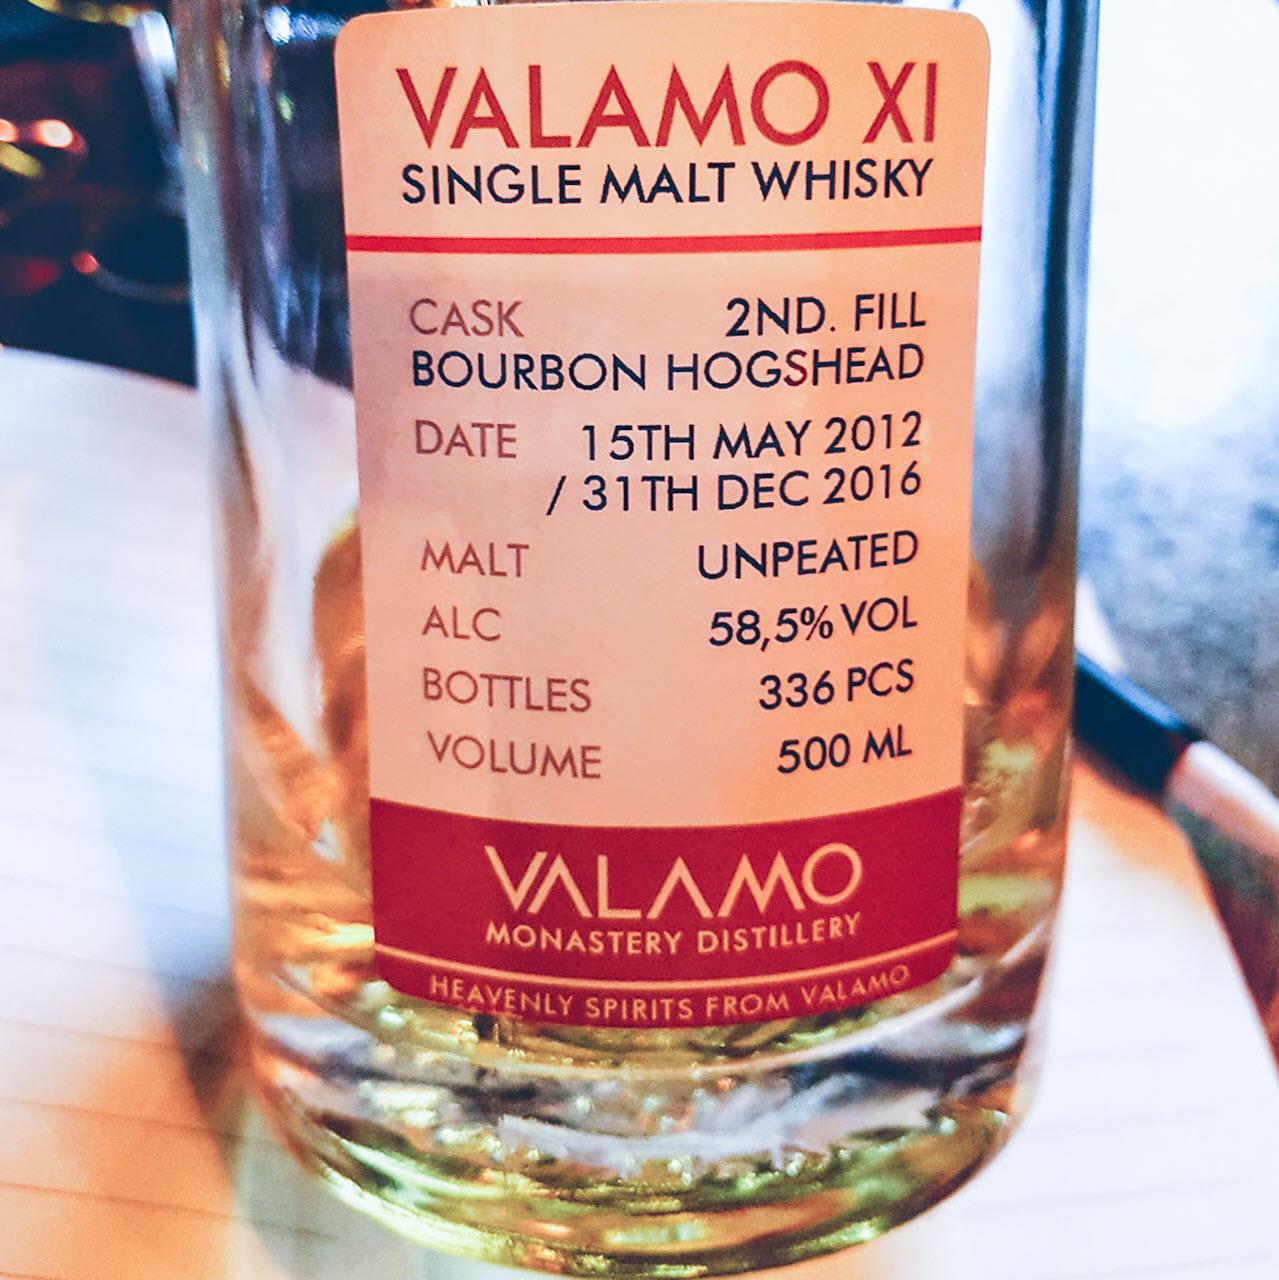 Nordic Whisky #182 - Valamo XI